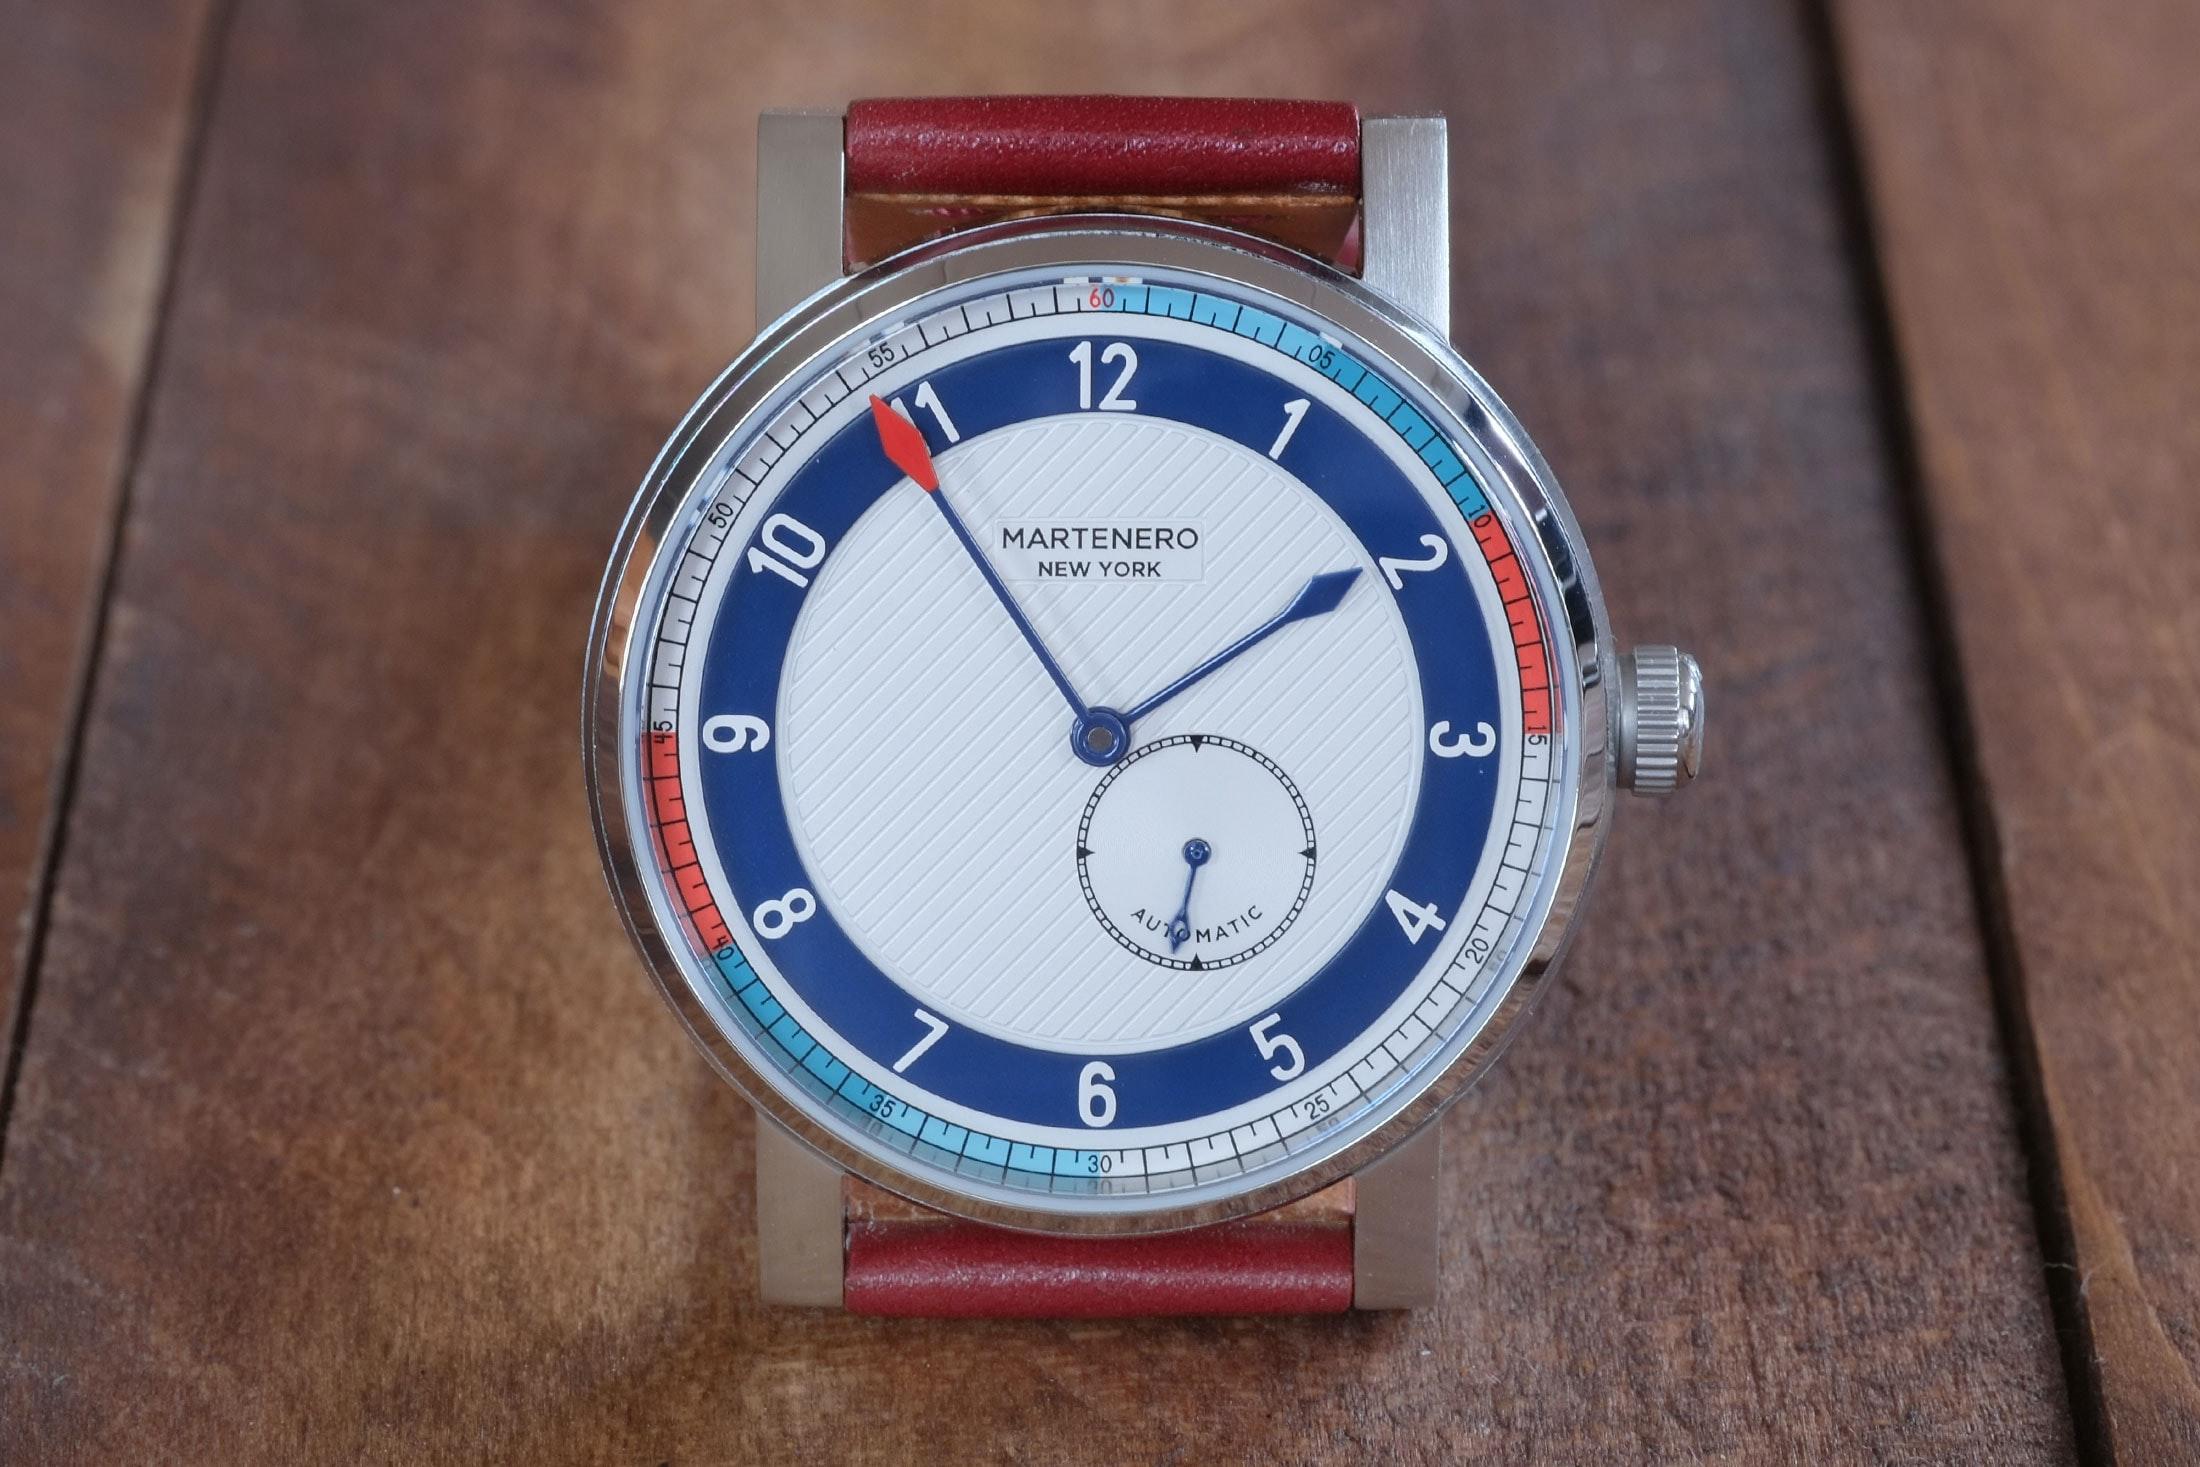 martenero edgemere colorful Hands-On: The Martenero Edgemere, A Marine Chronometer-Inspired Watch Designed In New York Hands-On: The Martenero Edgemere, A Marine Chronometer-Inspired Watch Designed In New York martenero 13